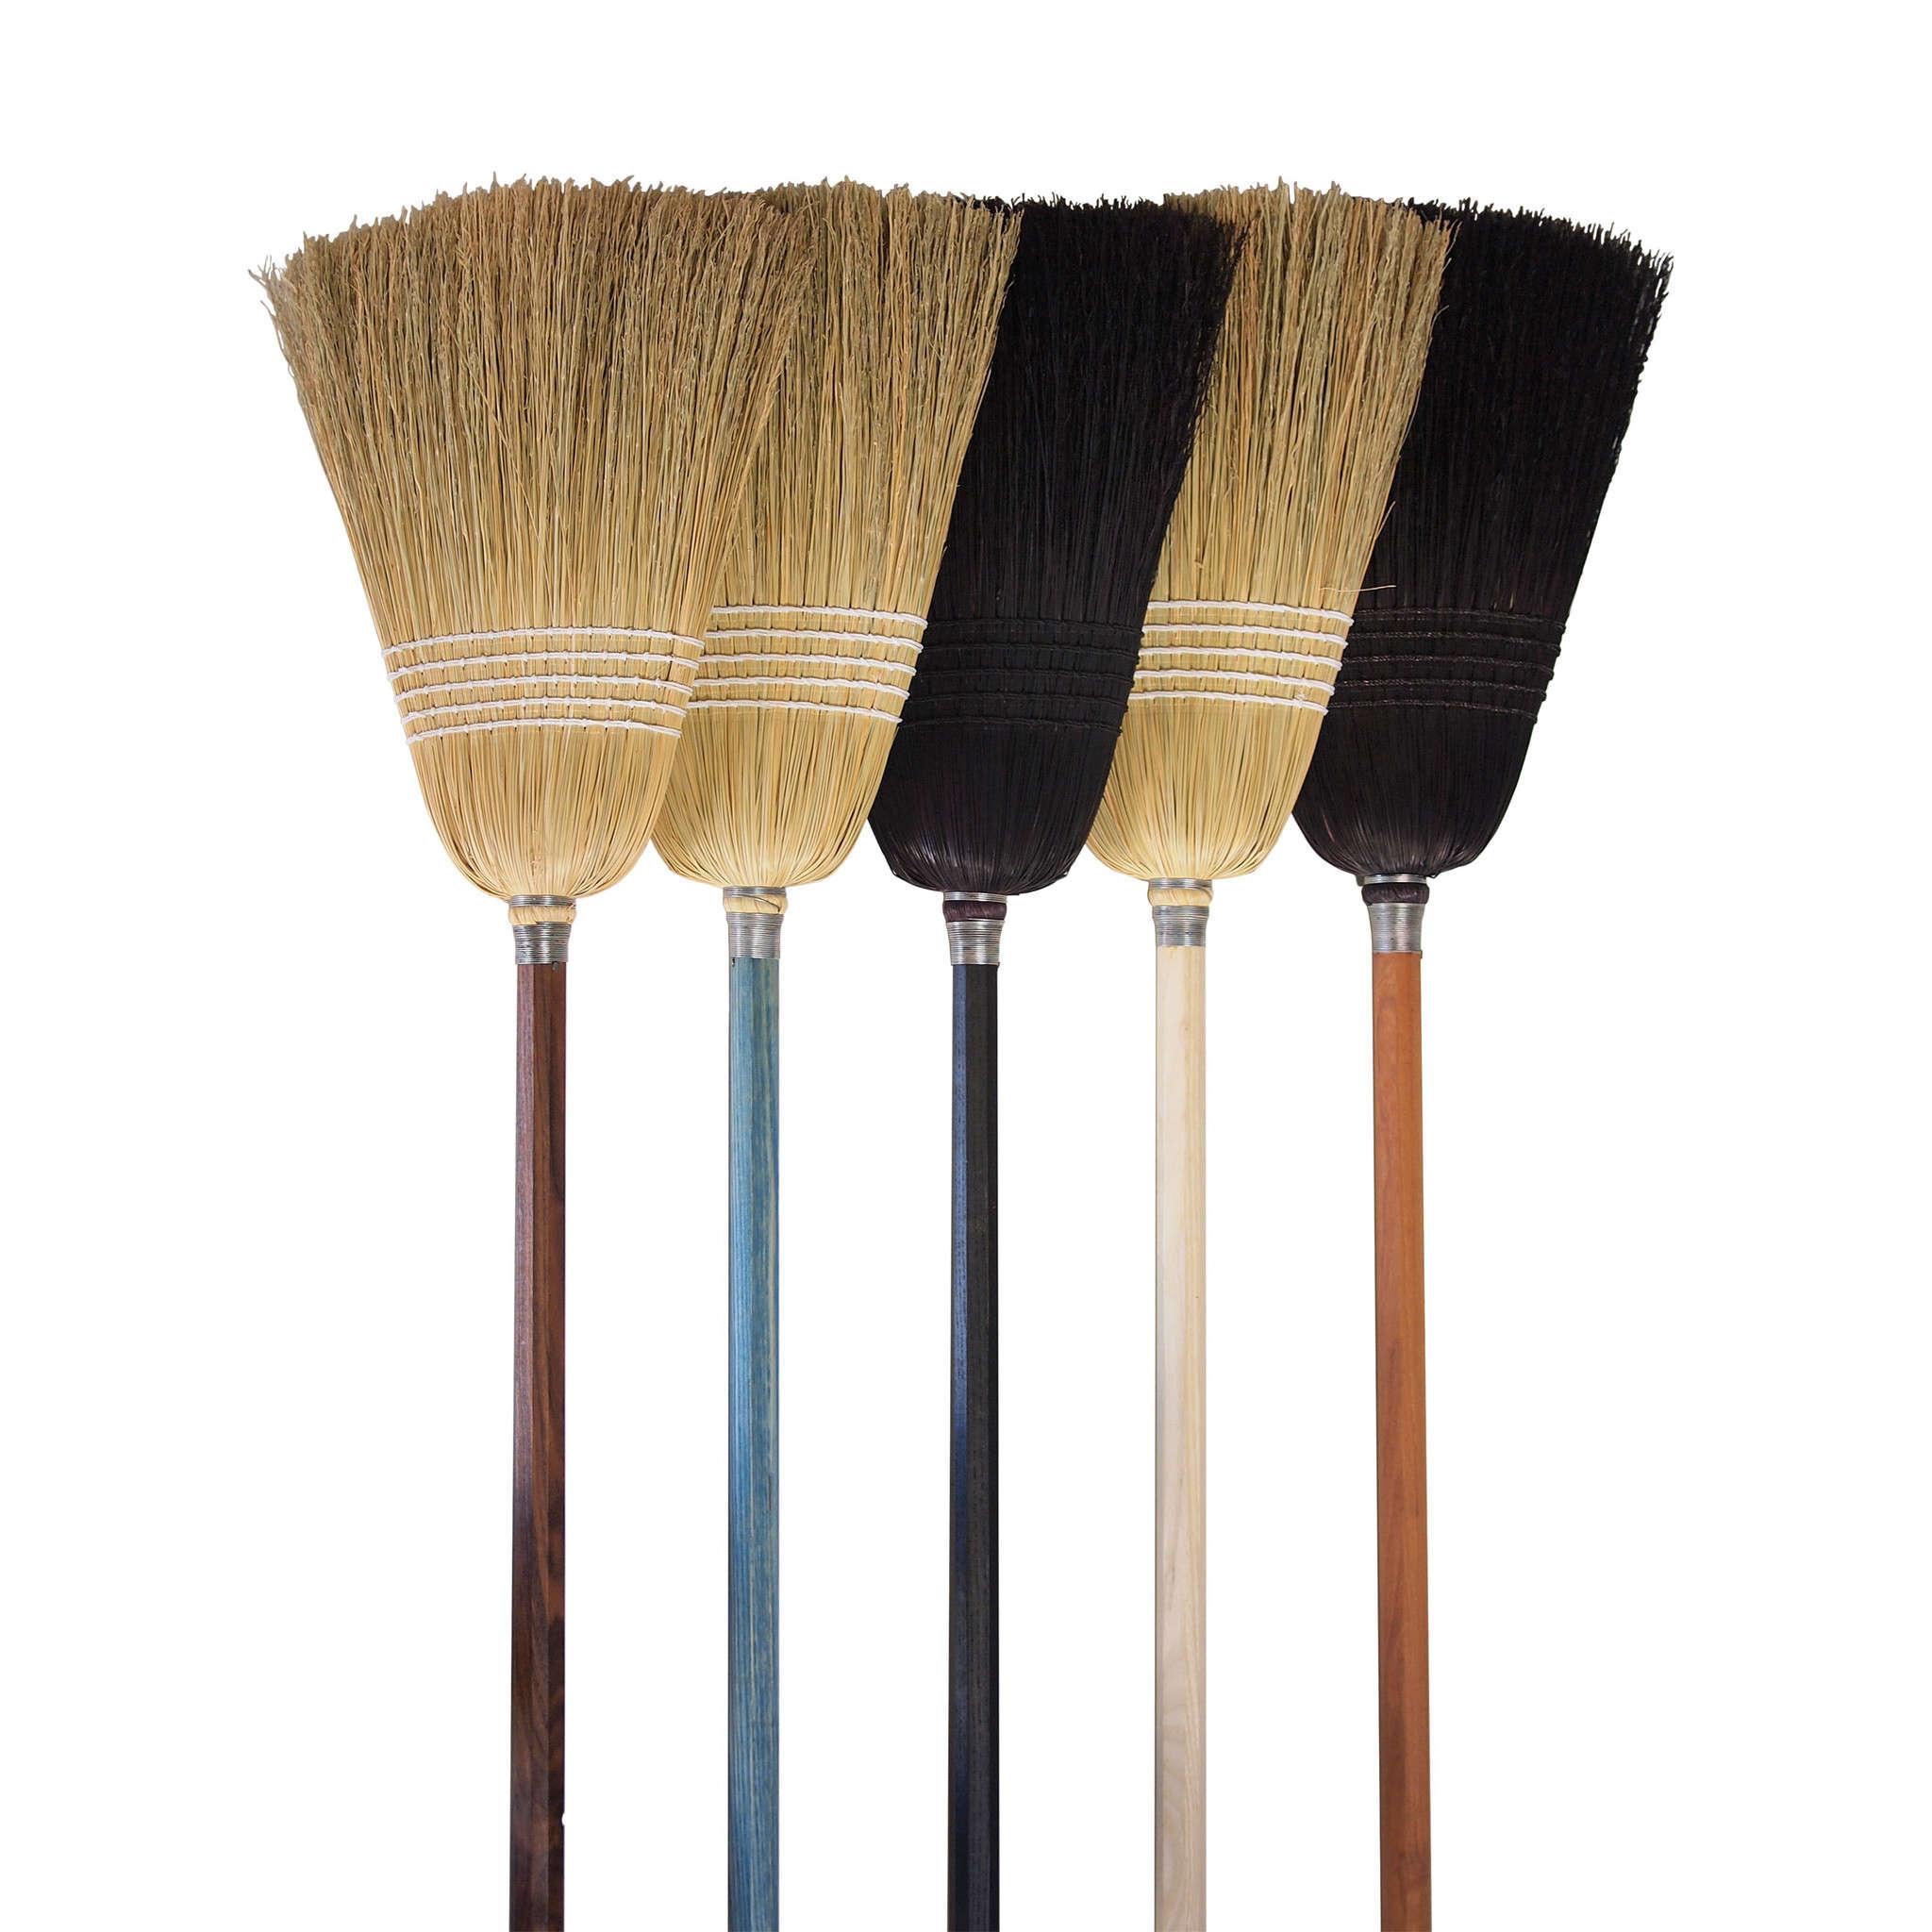 Hannah-Quinn-Brooms-Remodelista